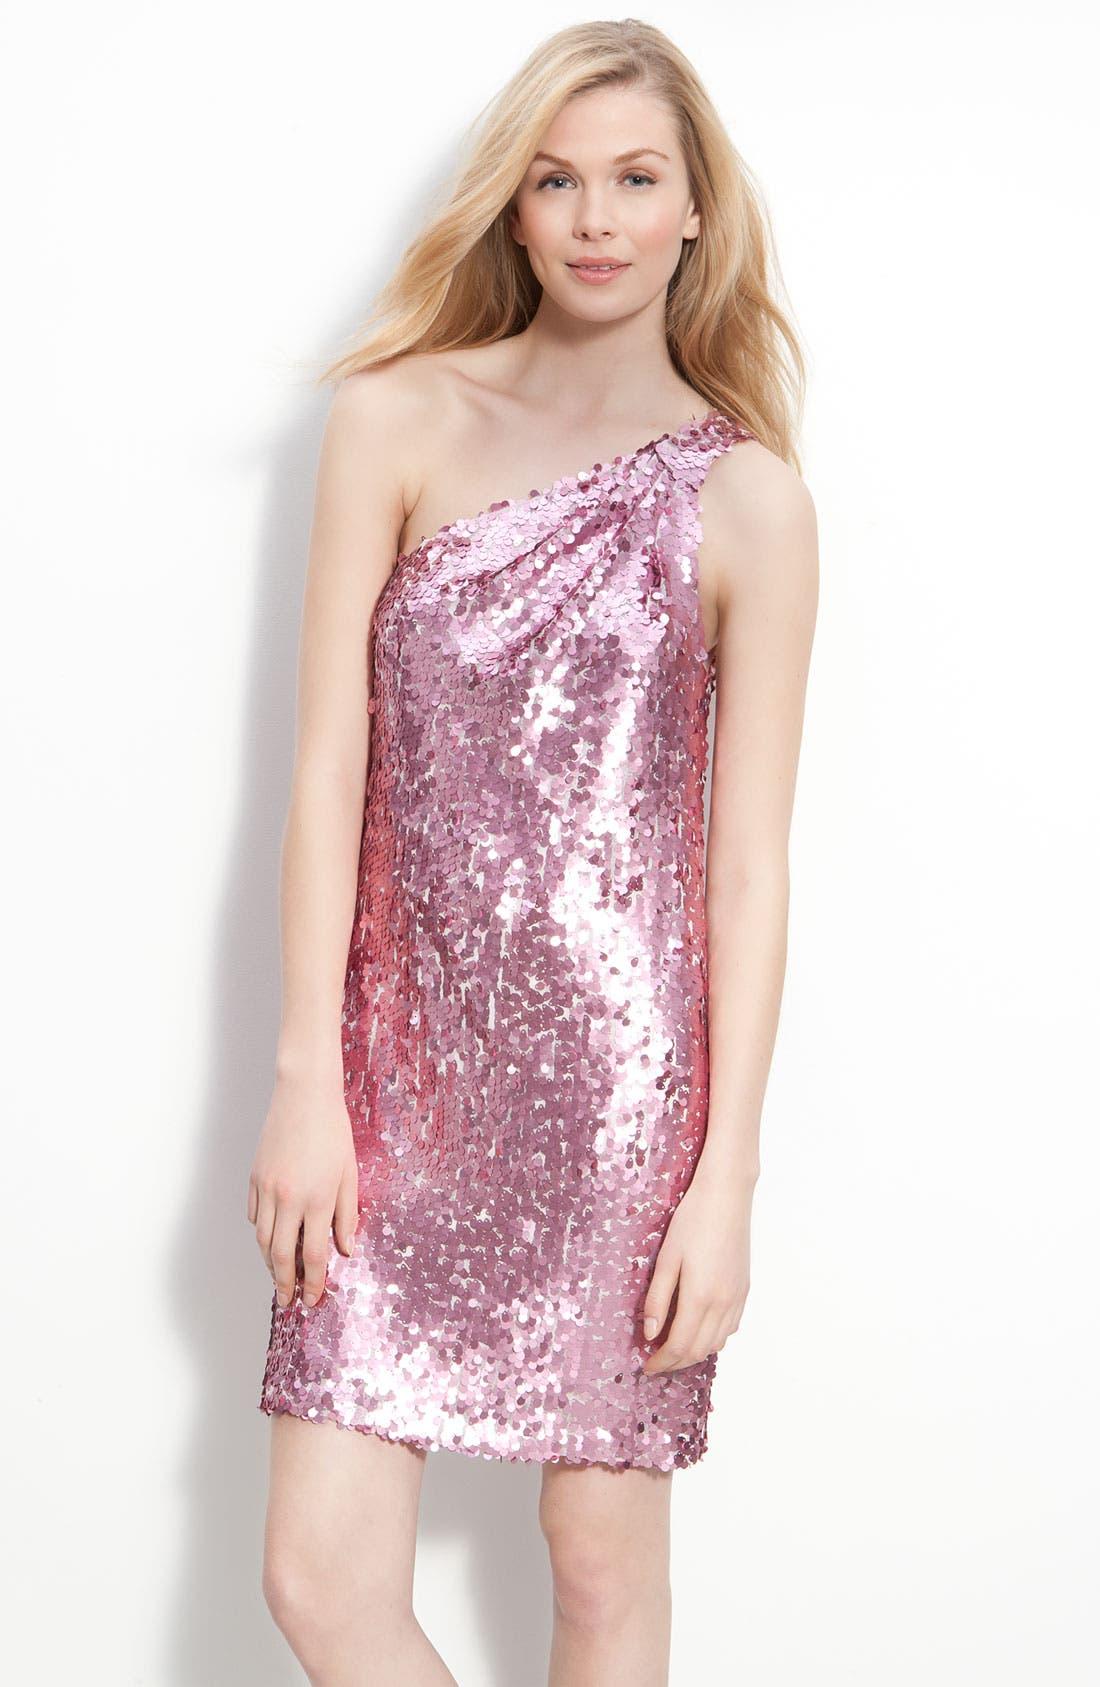 Main Image - Alexia Admor One Shoulder Sequin Dress